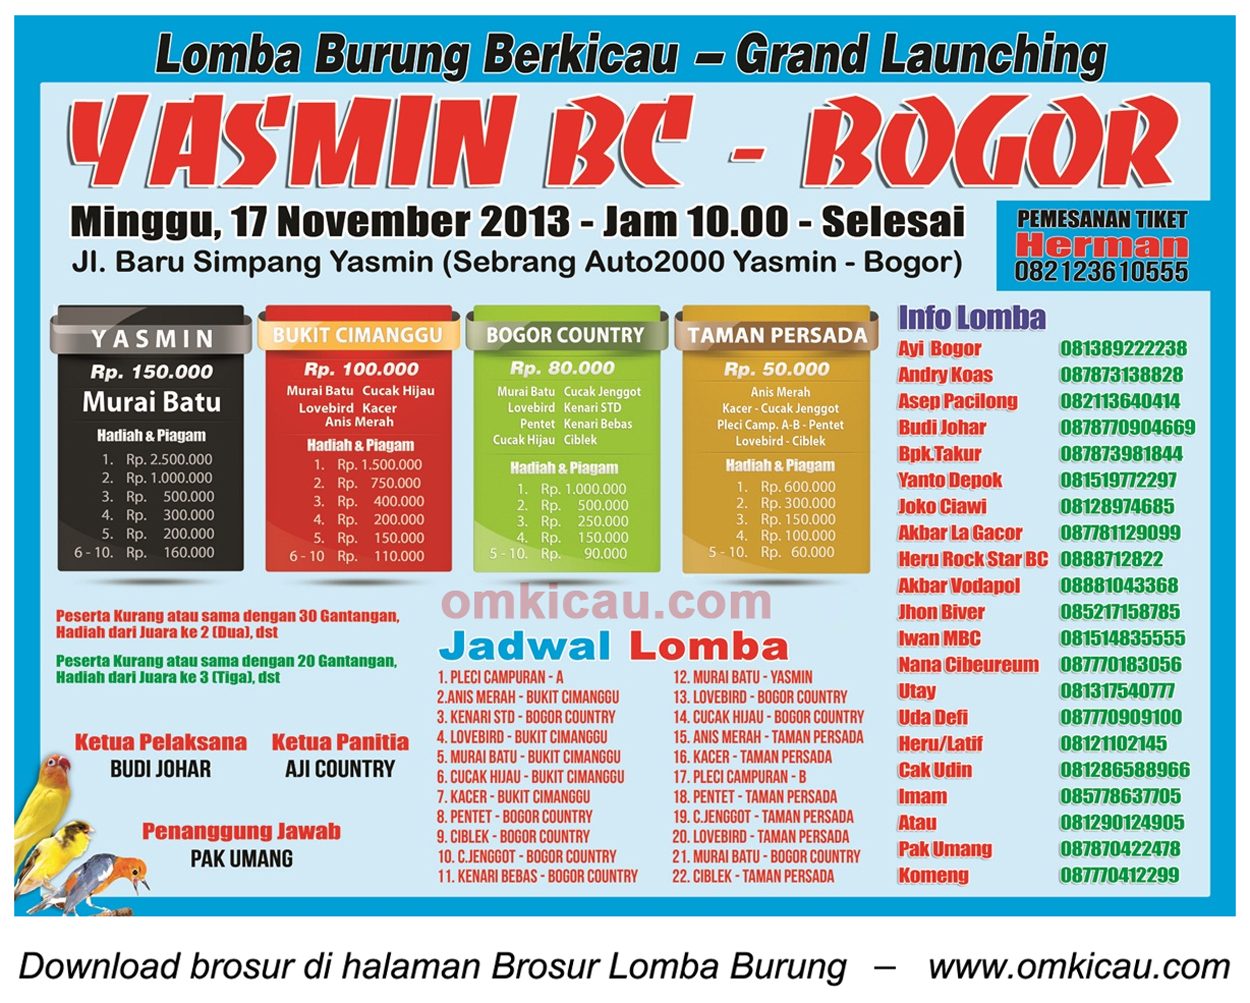 Brosur Lomba Burung Grand Launching Yasmin BC, Bogor, 17 November 2013